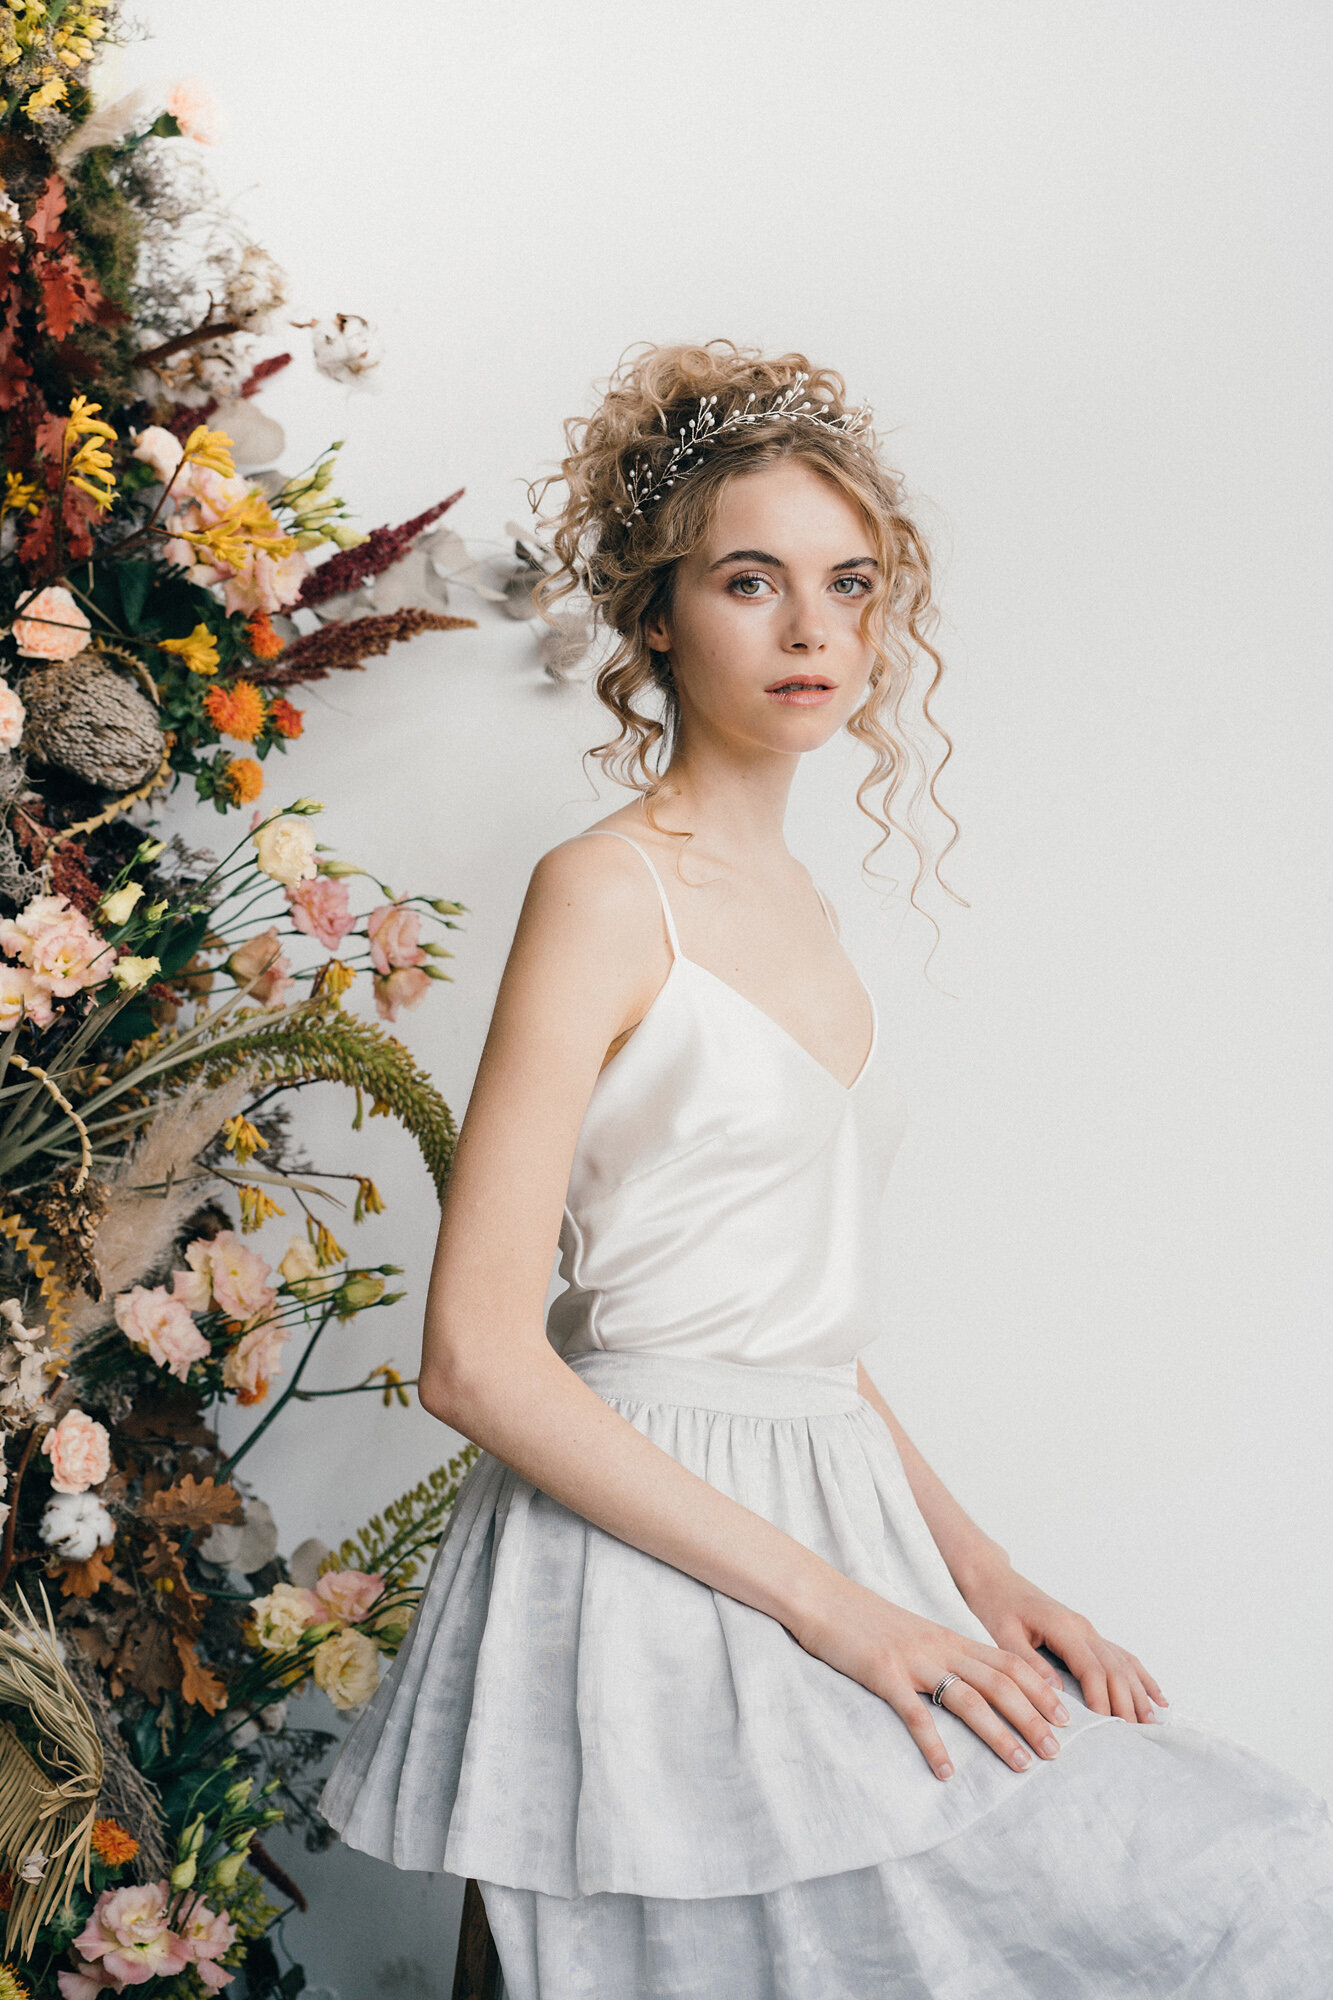 Debbie-Carlisle-Bridal-Accessories-Kate-Beaumont-Wedding-Gowns-Sheffield-Yorkshire-UK-24.jpg